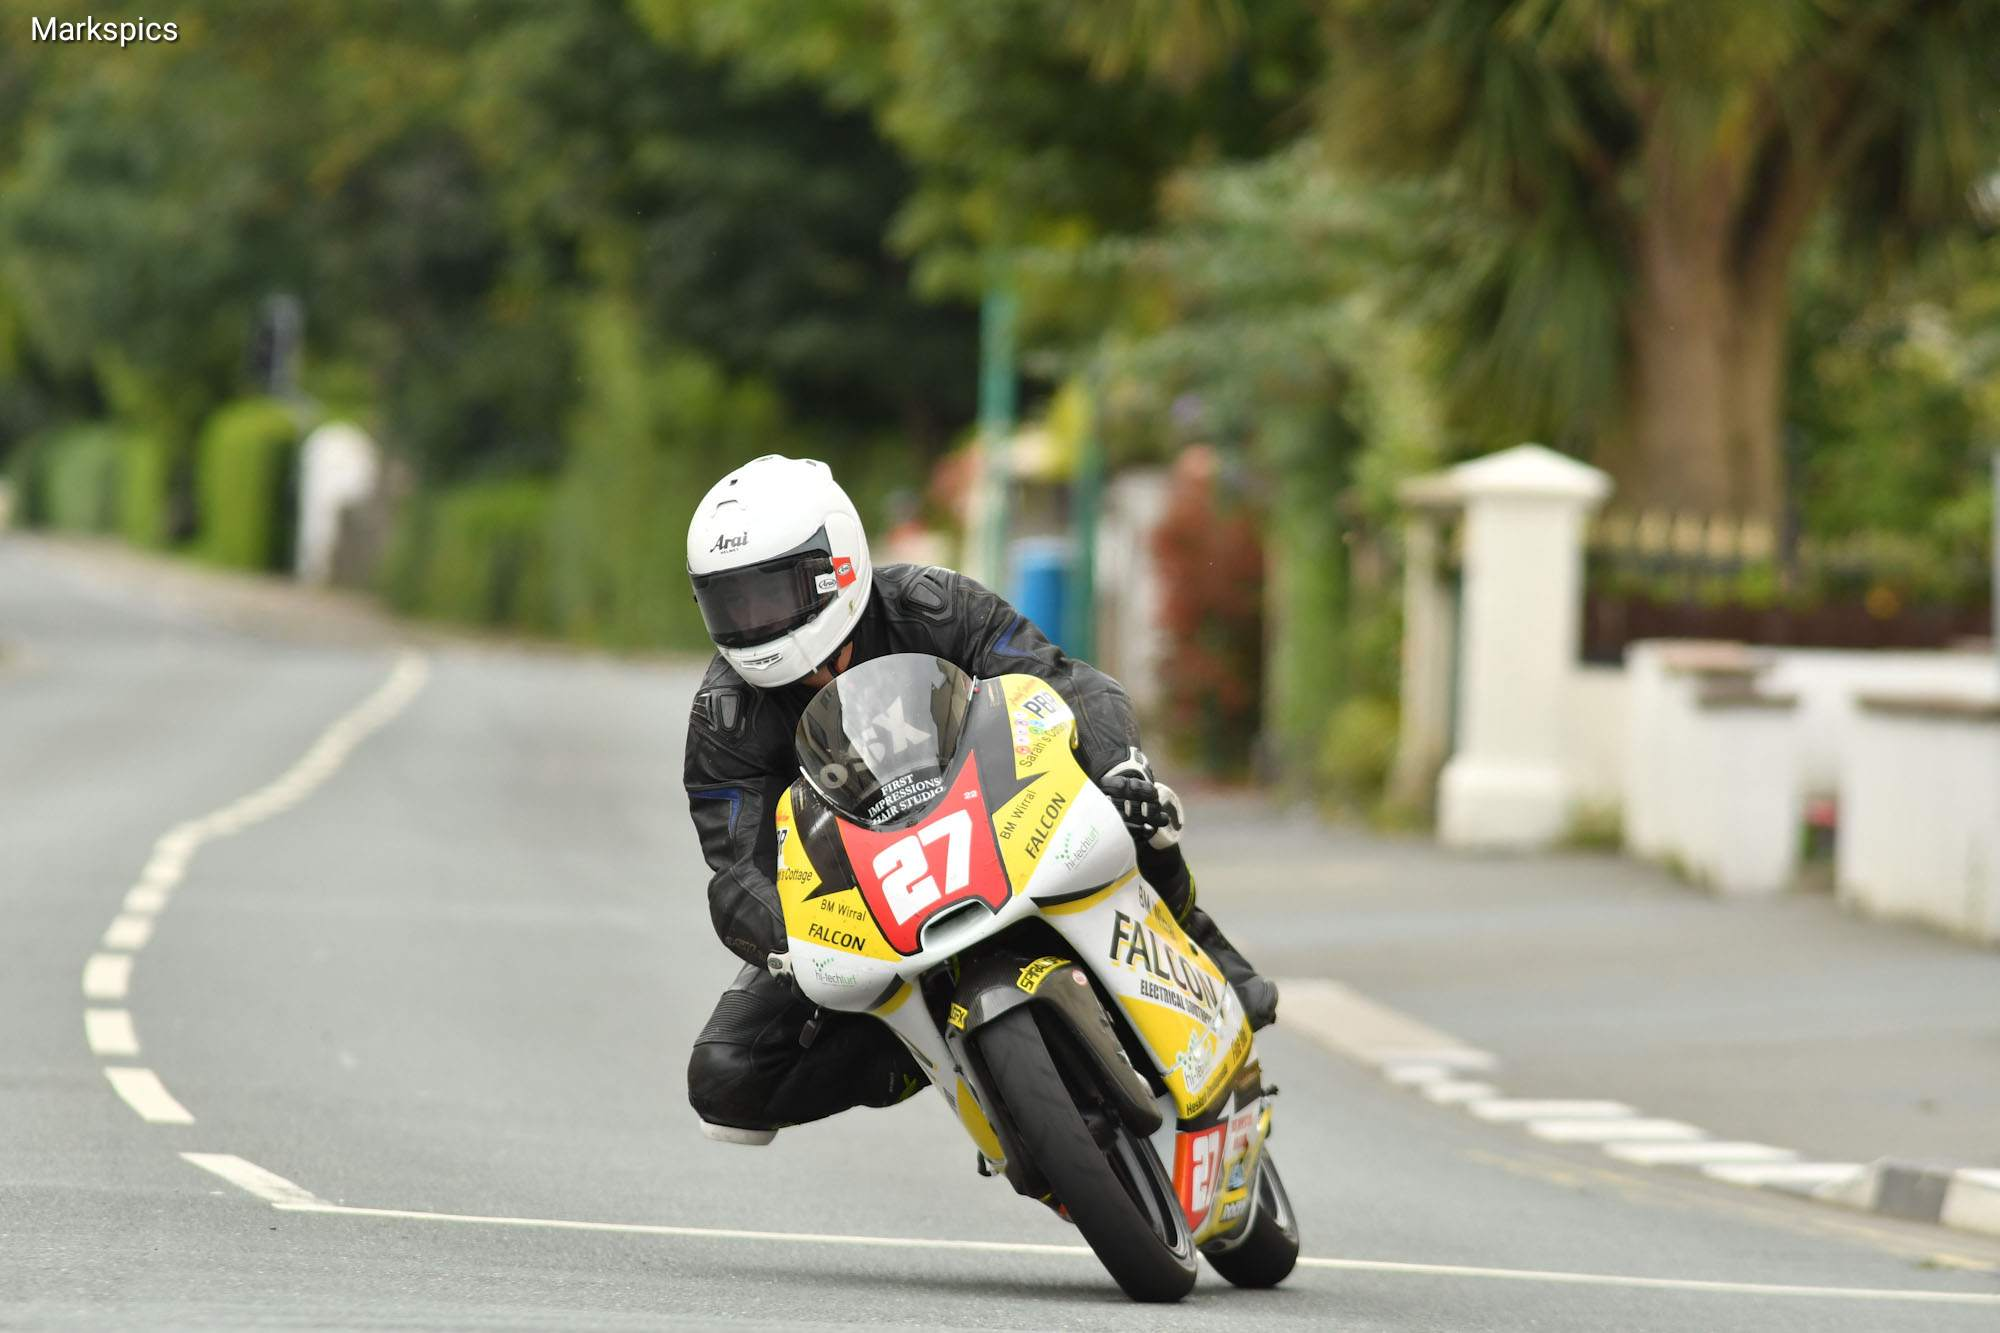 Manx GP Winner Jackson Targets Classic TT Presence